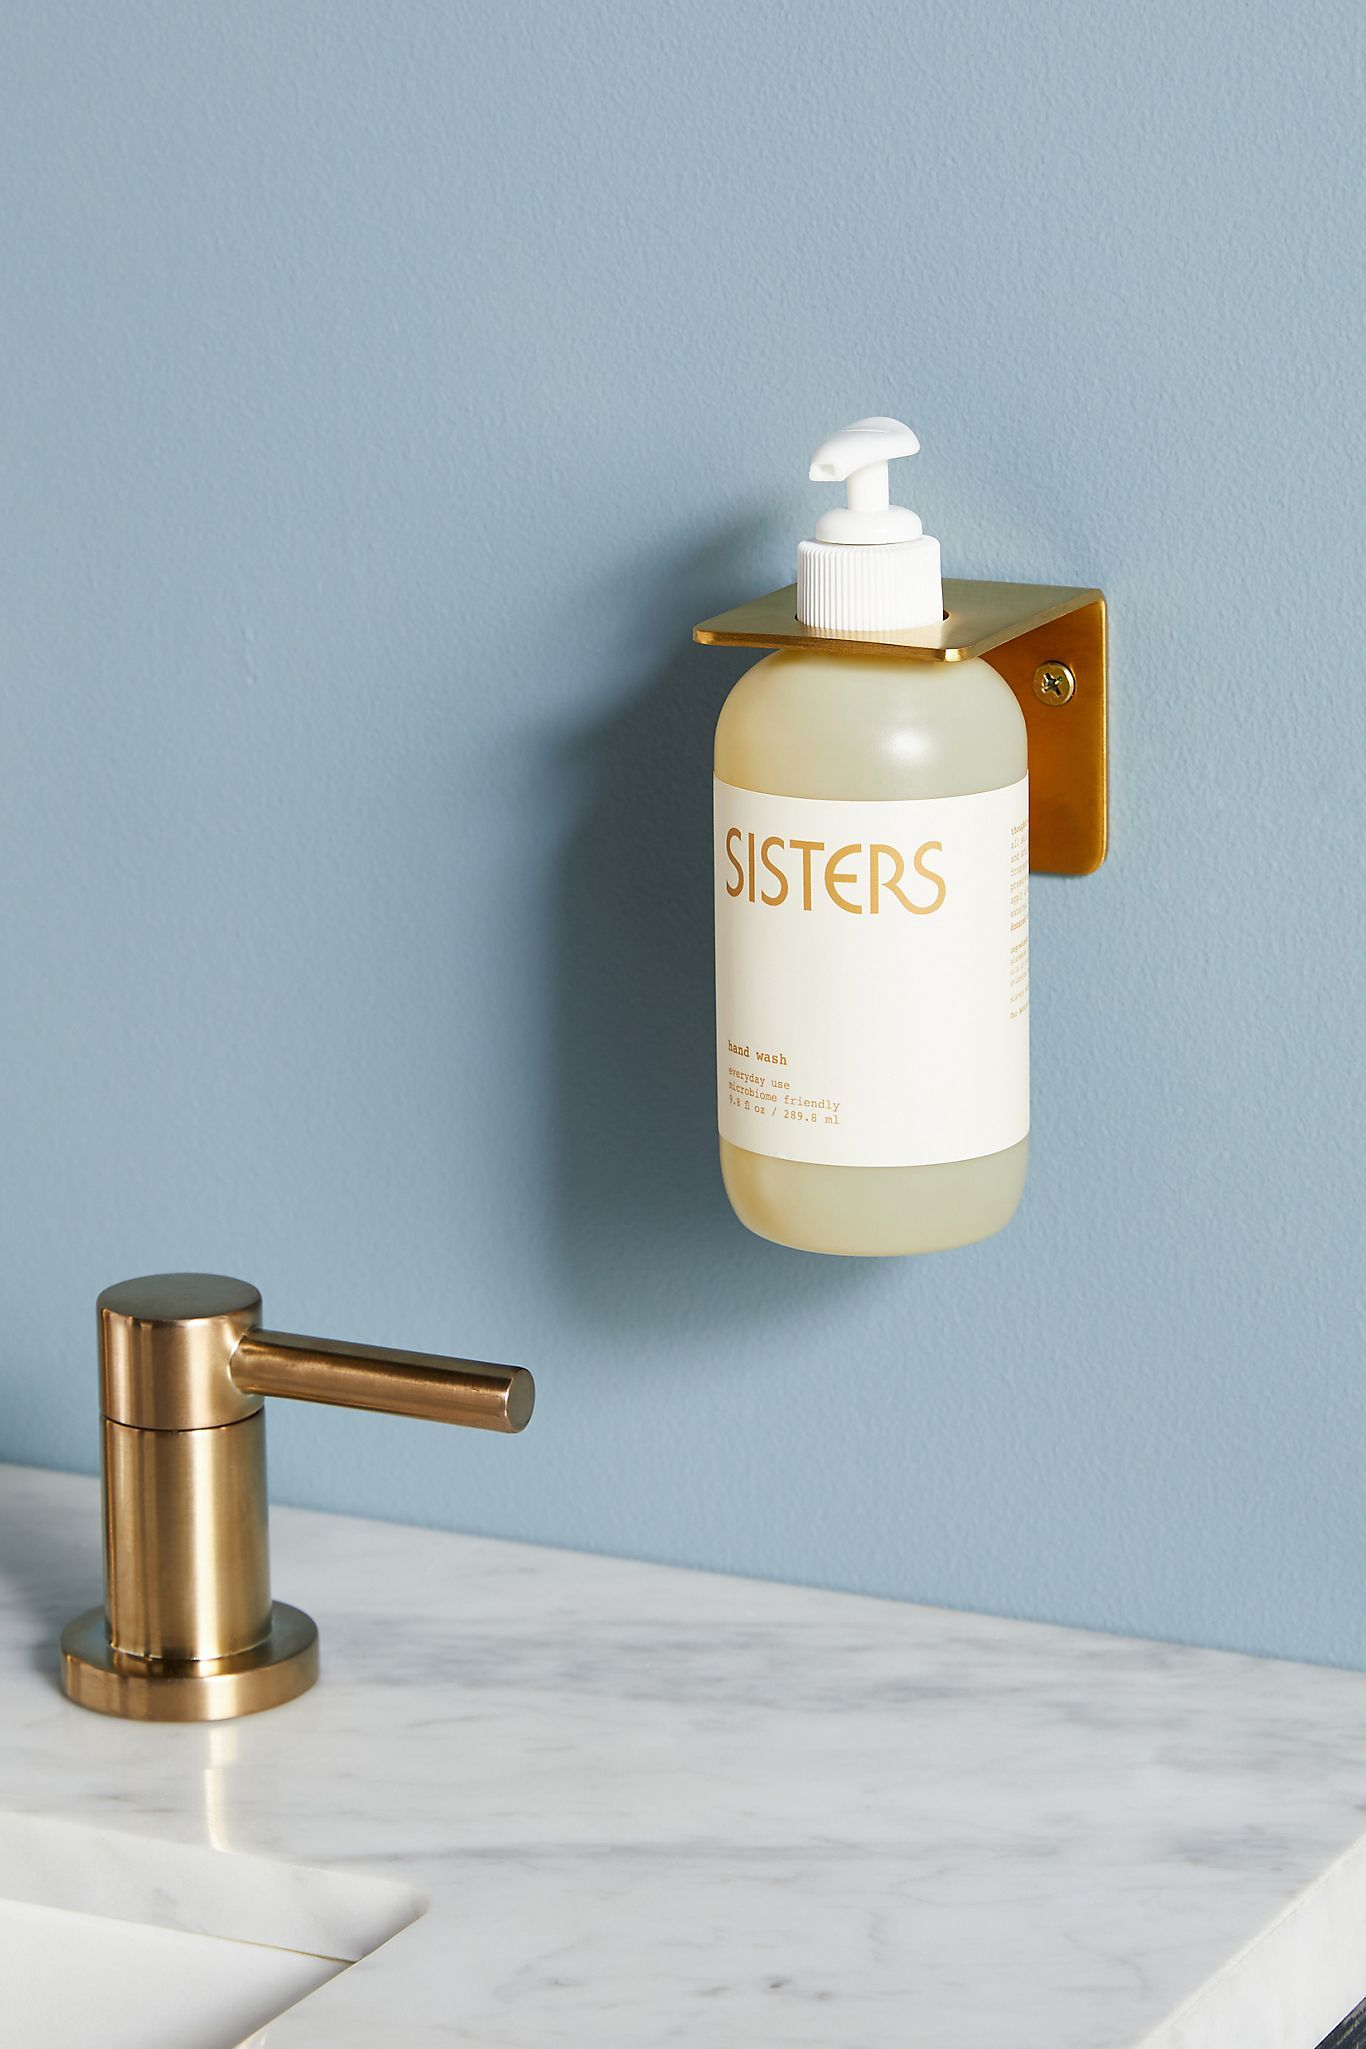 Anthropologie Wall-Mounted Soap Bottle Holder